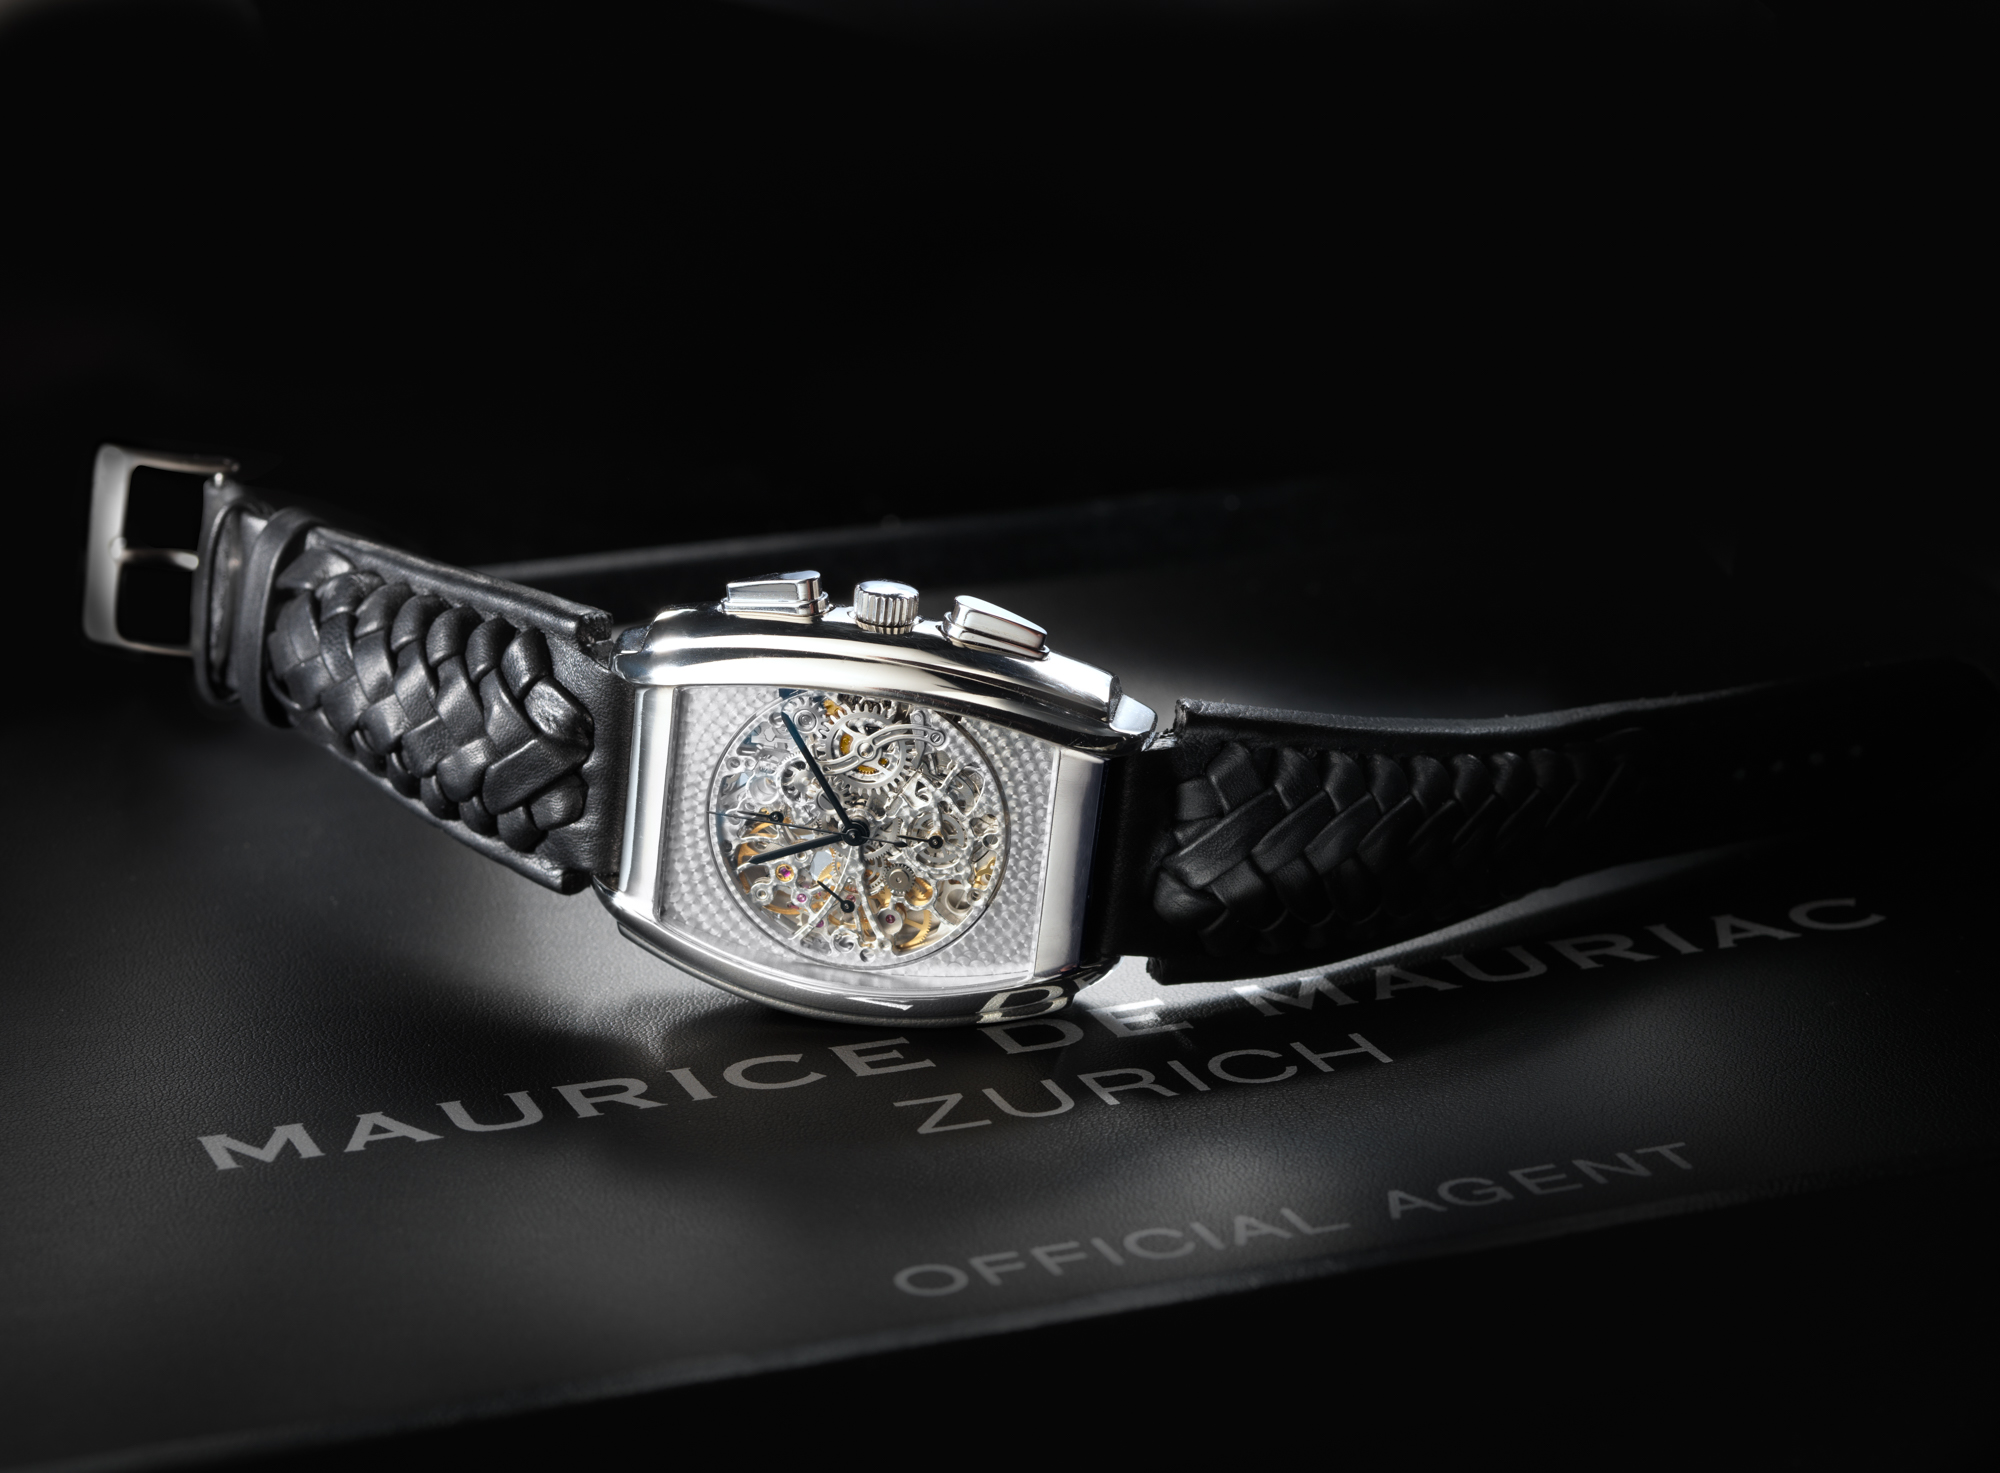 Maurice de Mauriac Uhren, Uhrenfotografie, Zürich, Schweiz